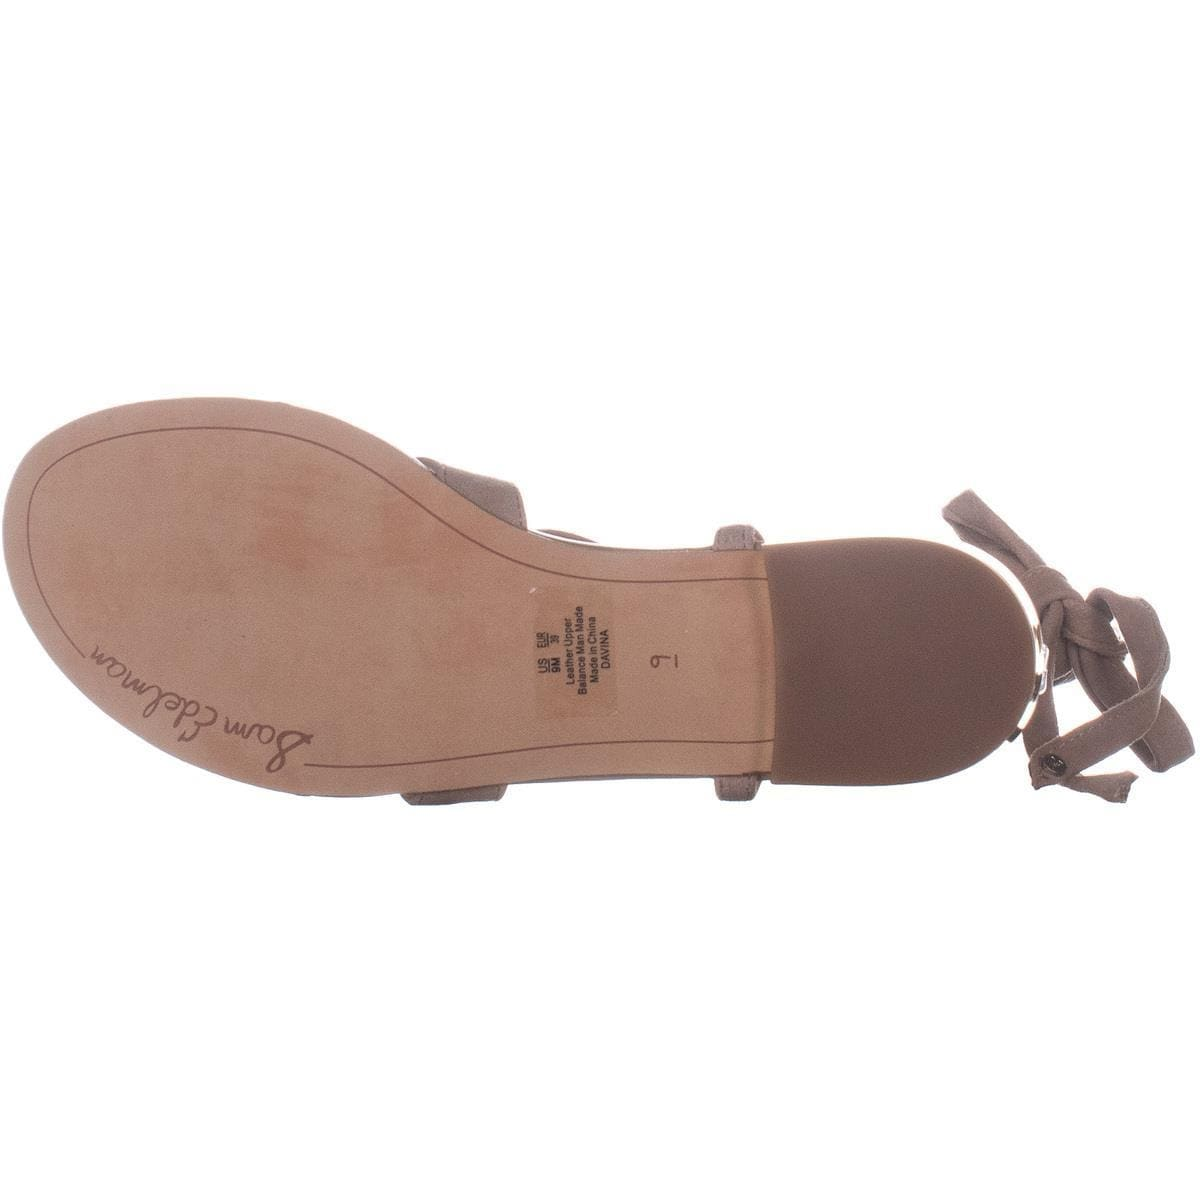 ab757fd90 Shop Sam Edelman Davina Lace Up Flat Sandals